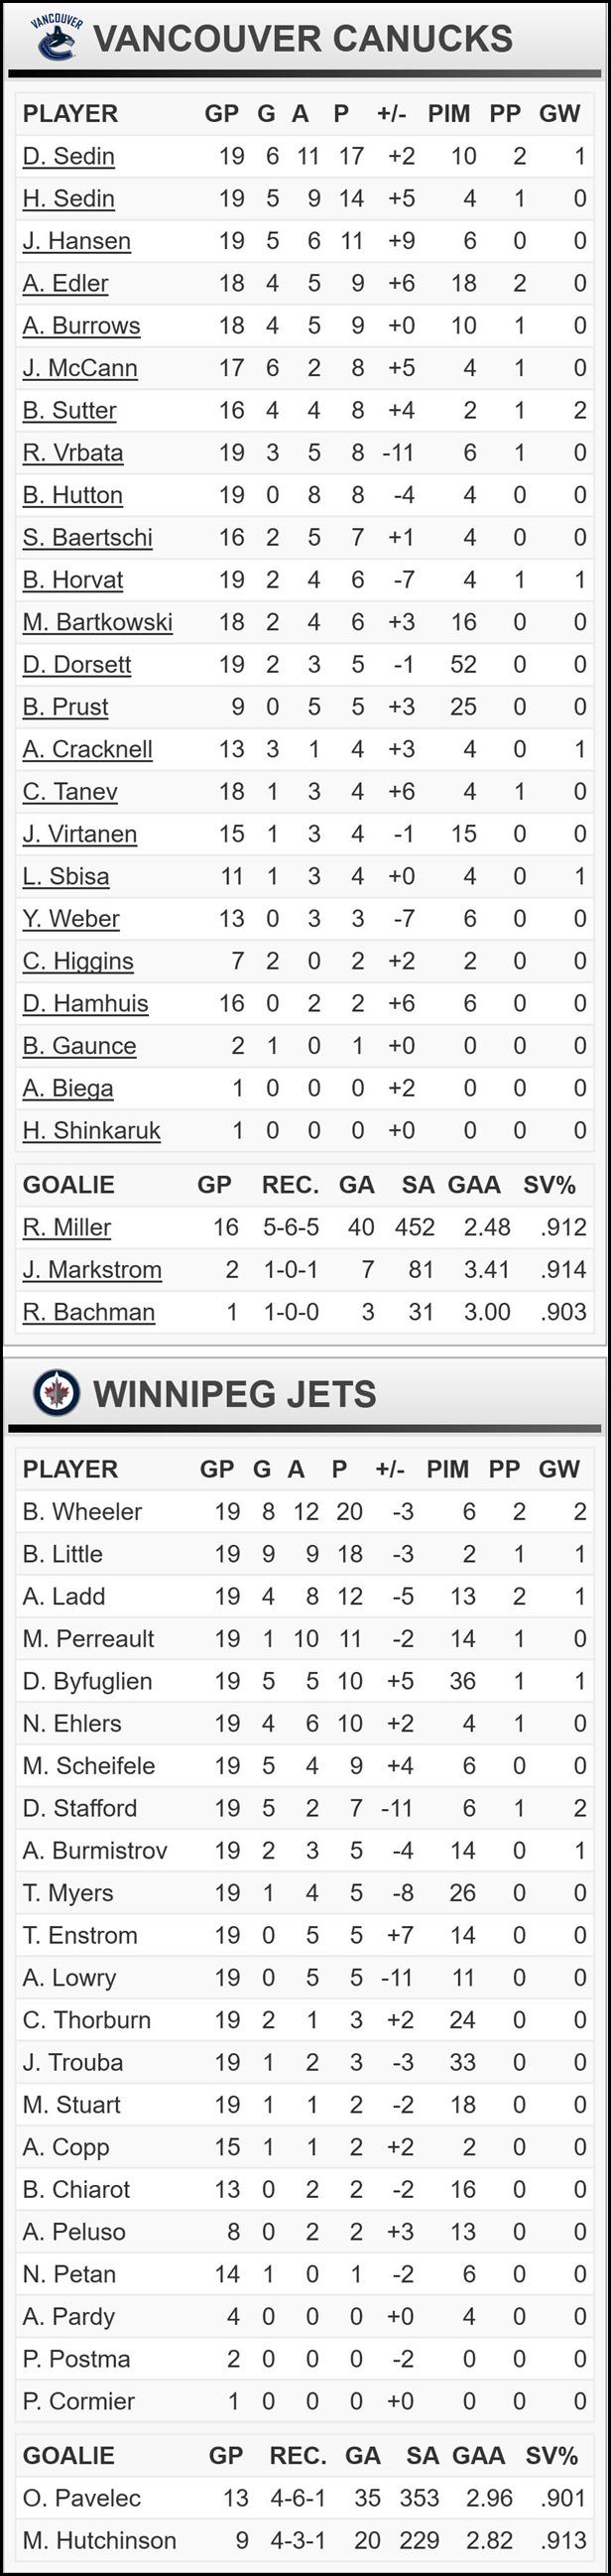 FireShot Screen Capture #146 - 'Vancouver Canucks at Winnipeg Jets - 11_18_2015' - canucks_nhl_com_gamecenter_en_preview_id=2015020275